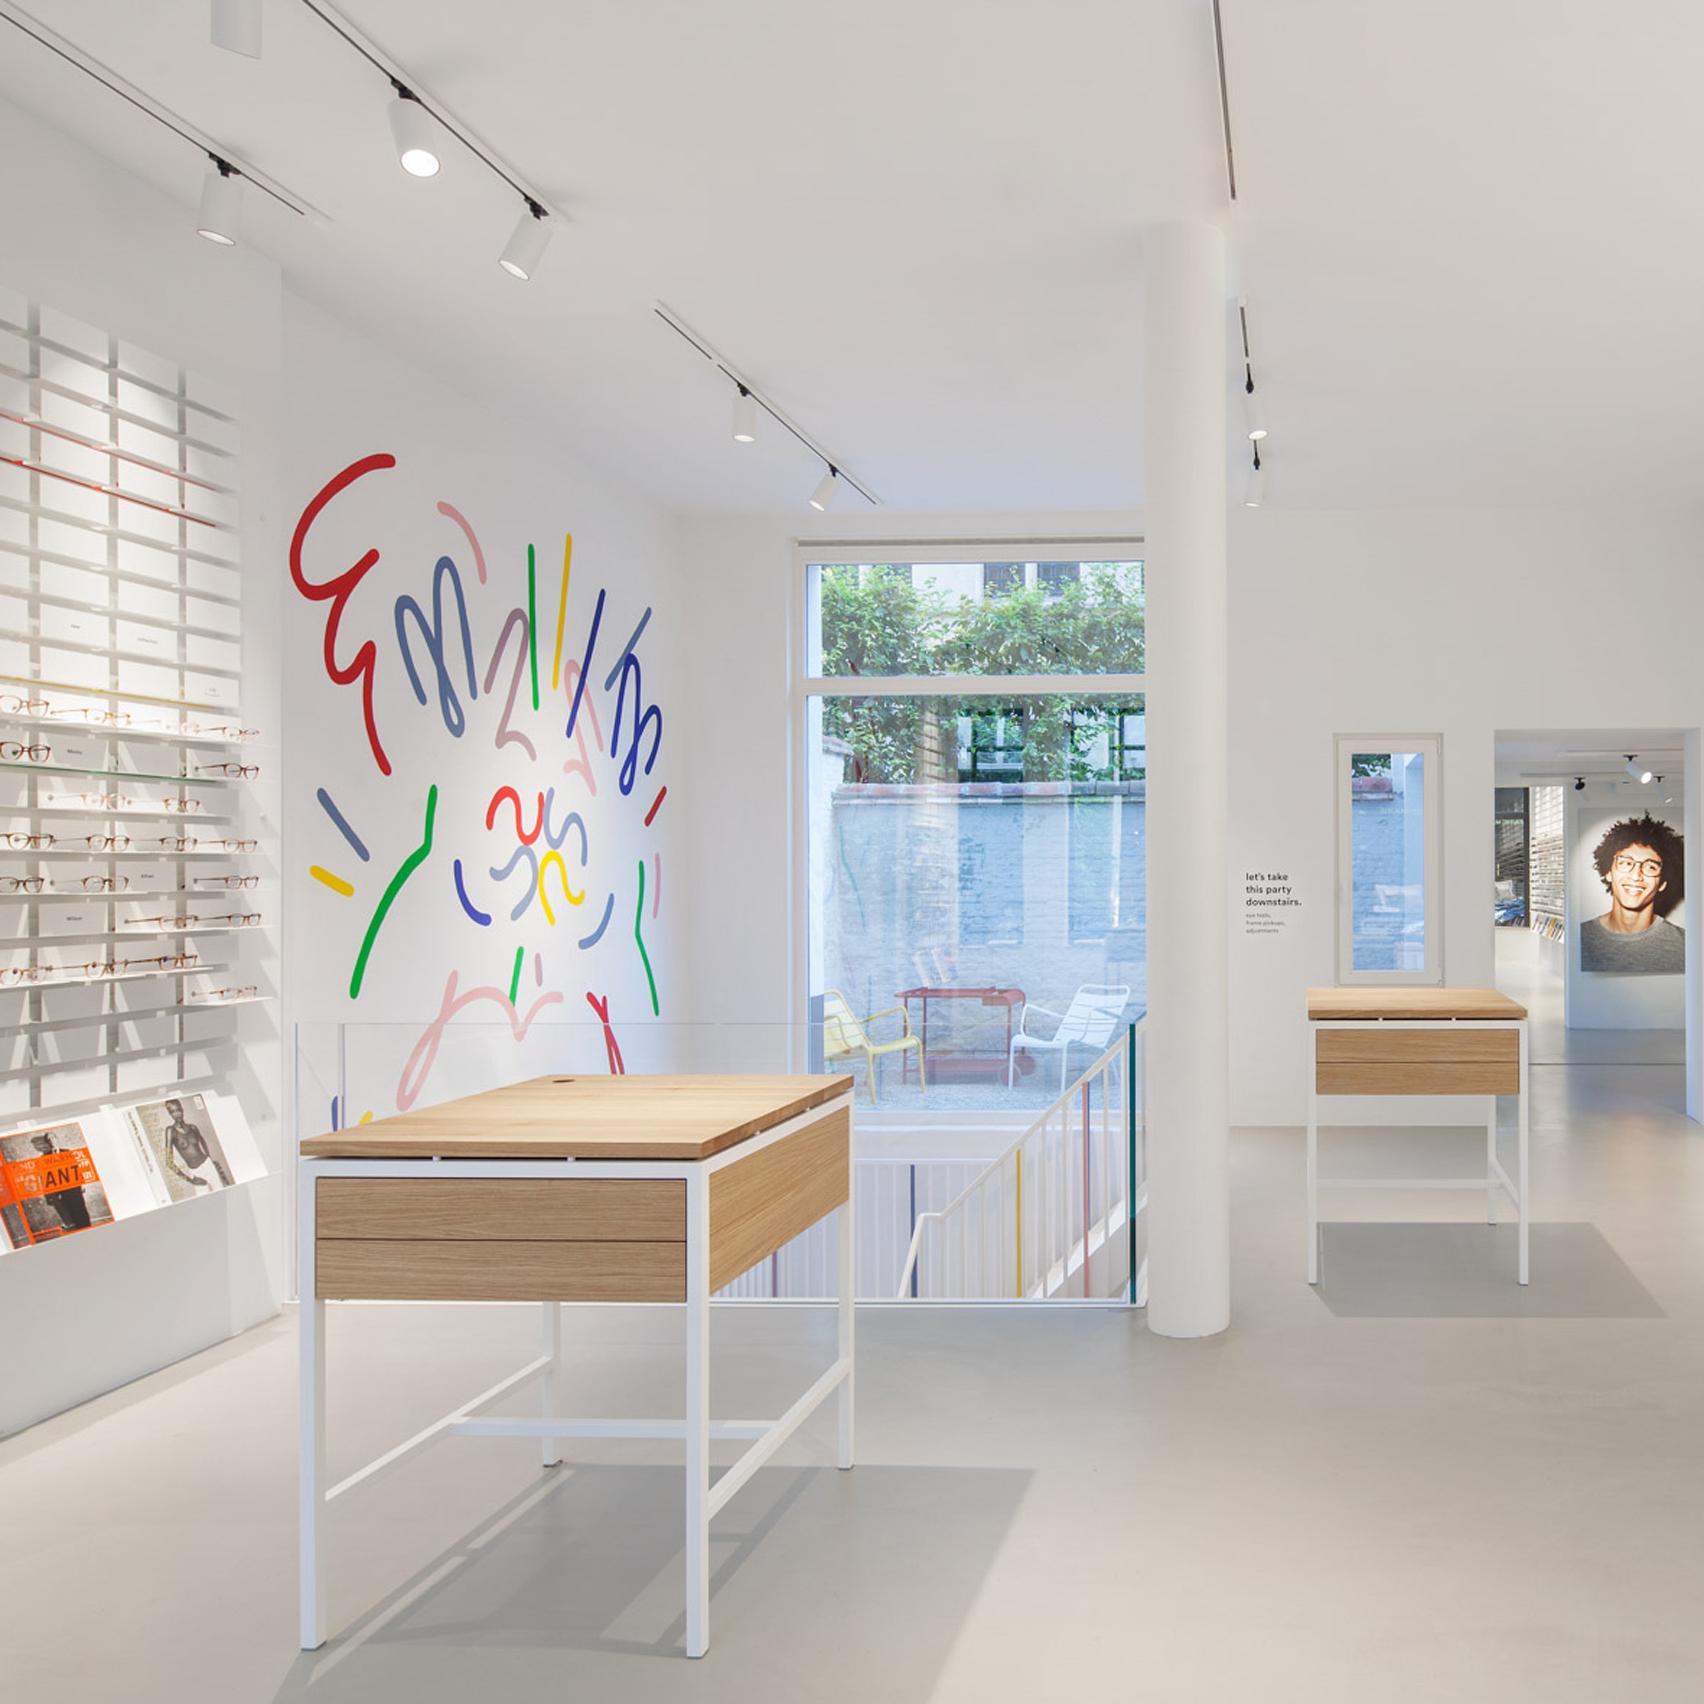 Standard Studio Designs Minimal Interior For Antwerp Glasses Store